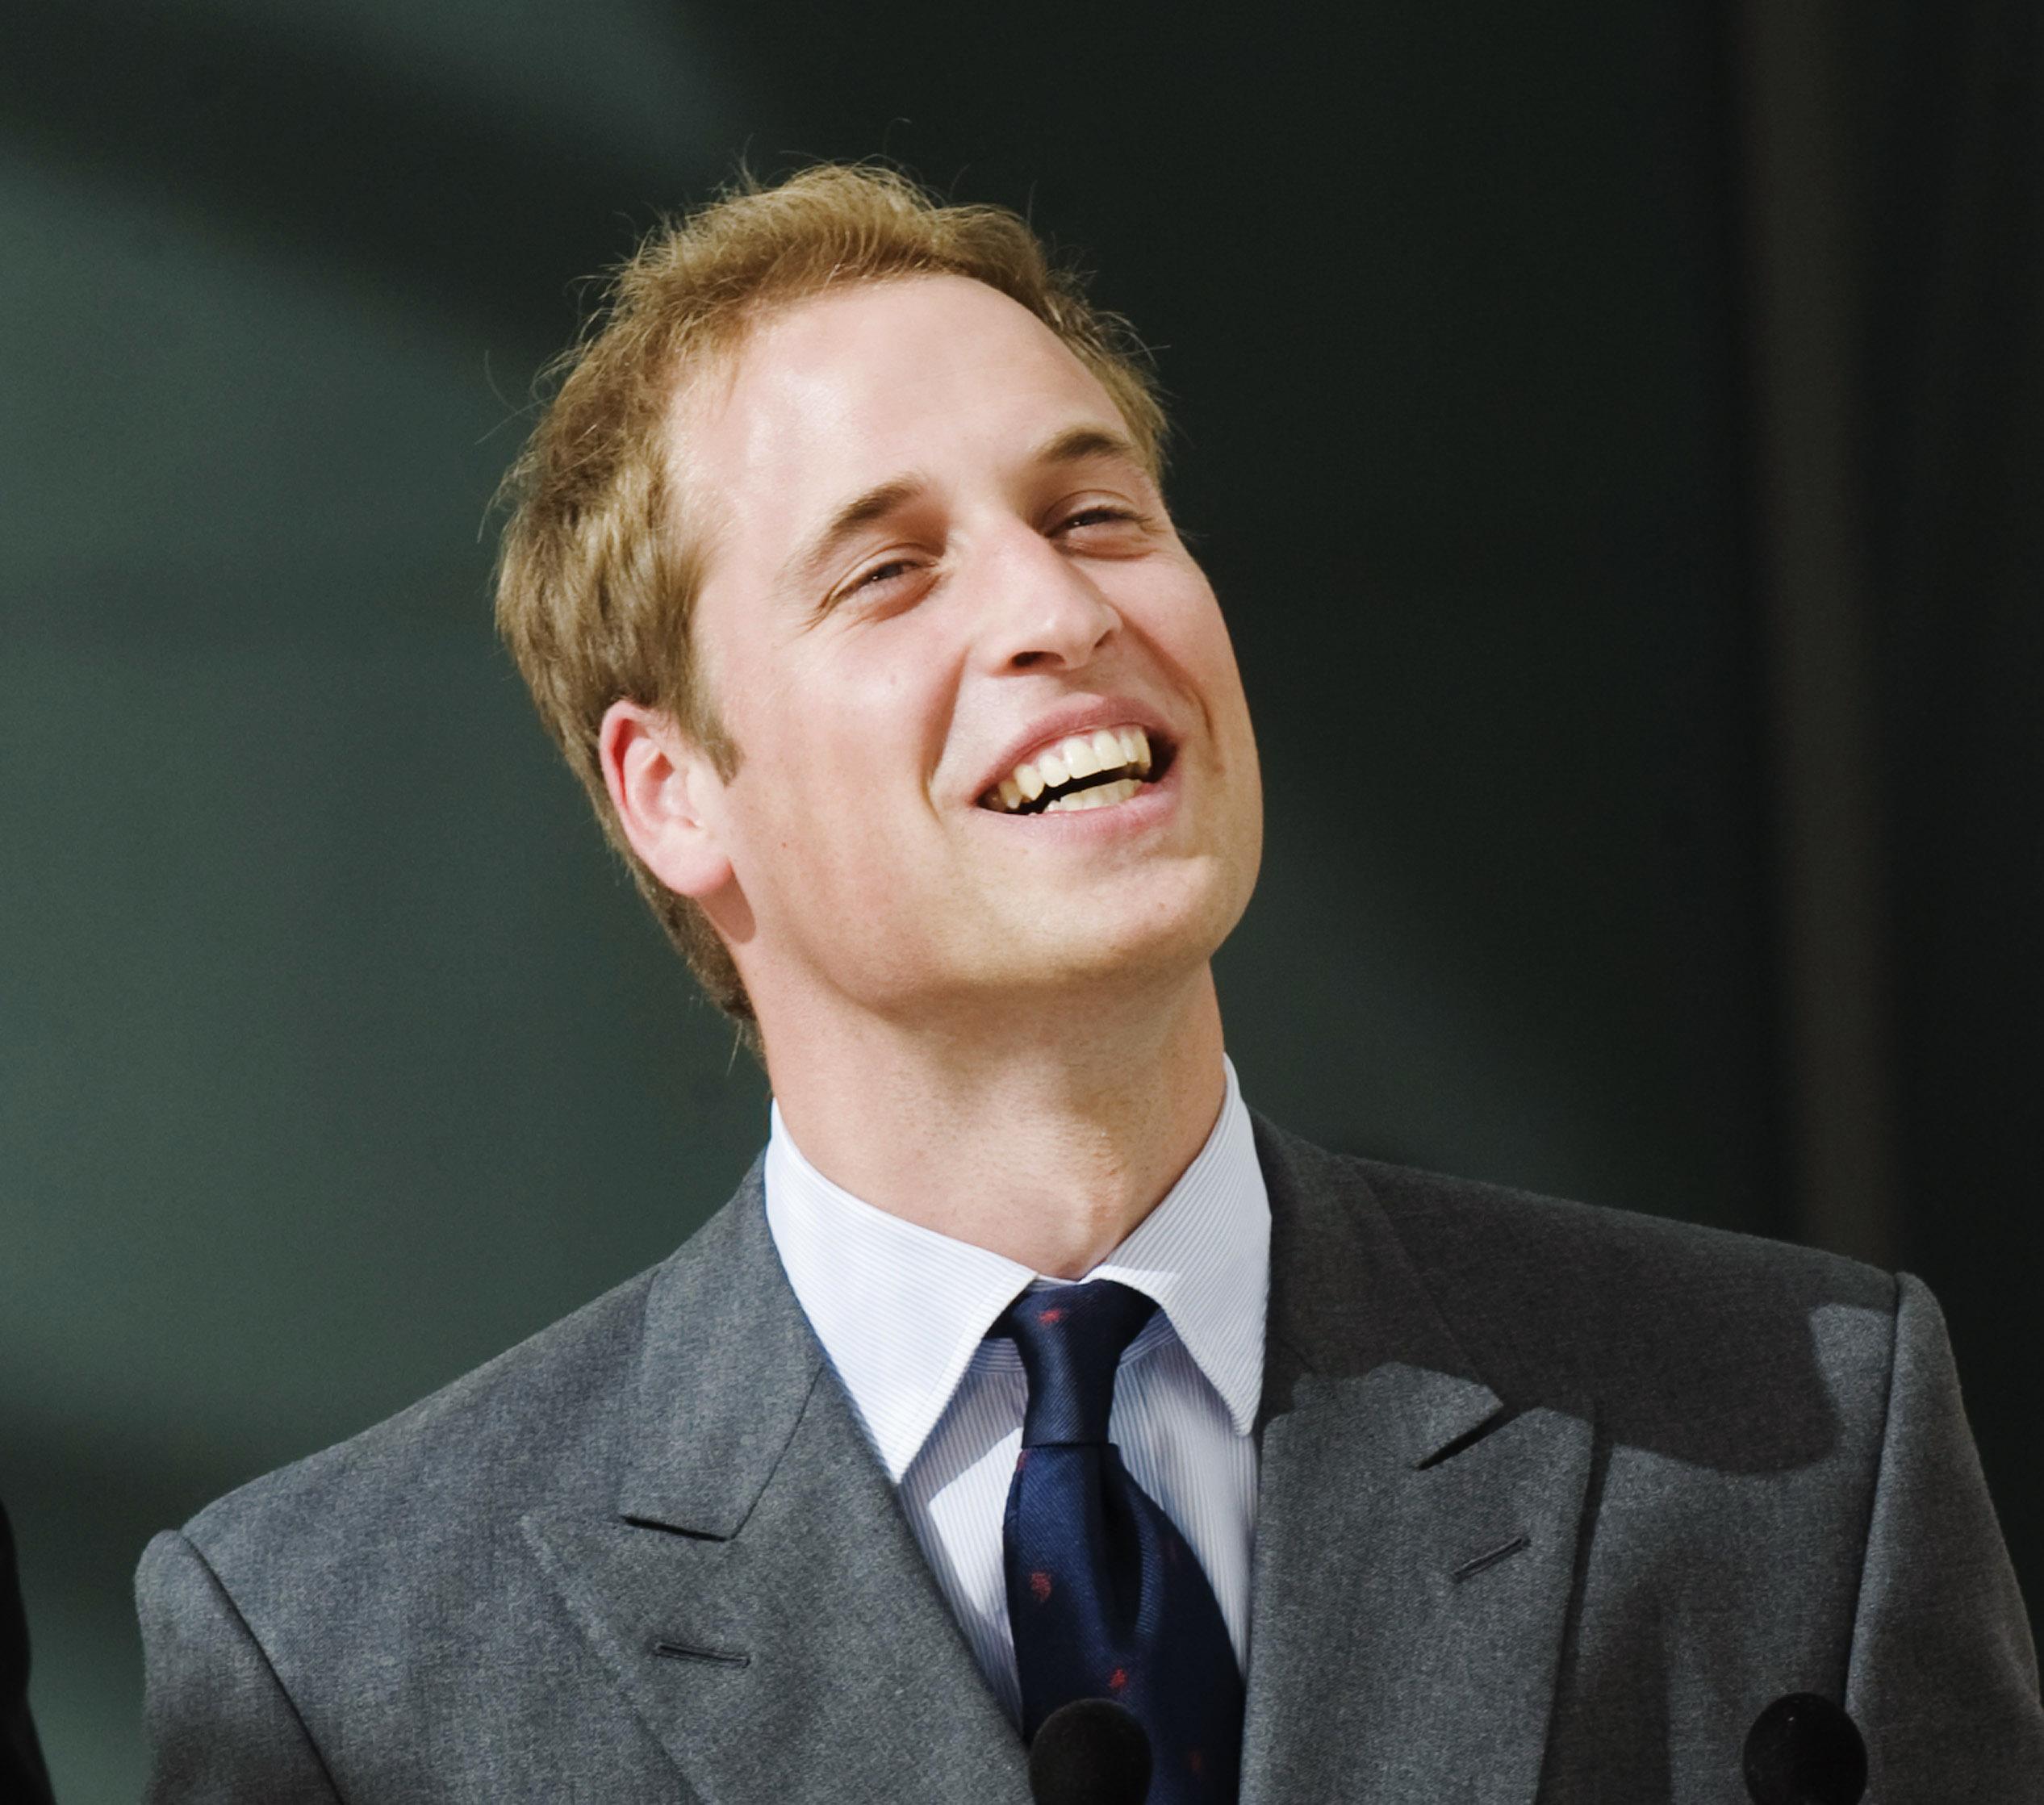 Prince William Desktop